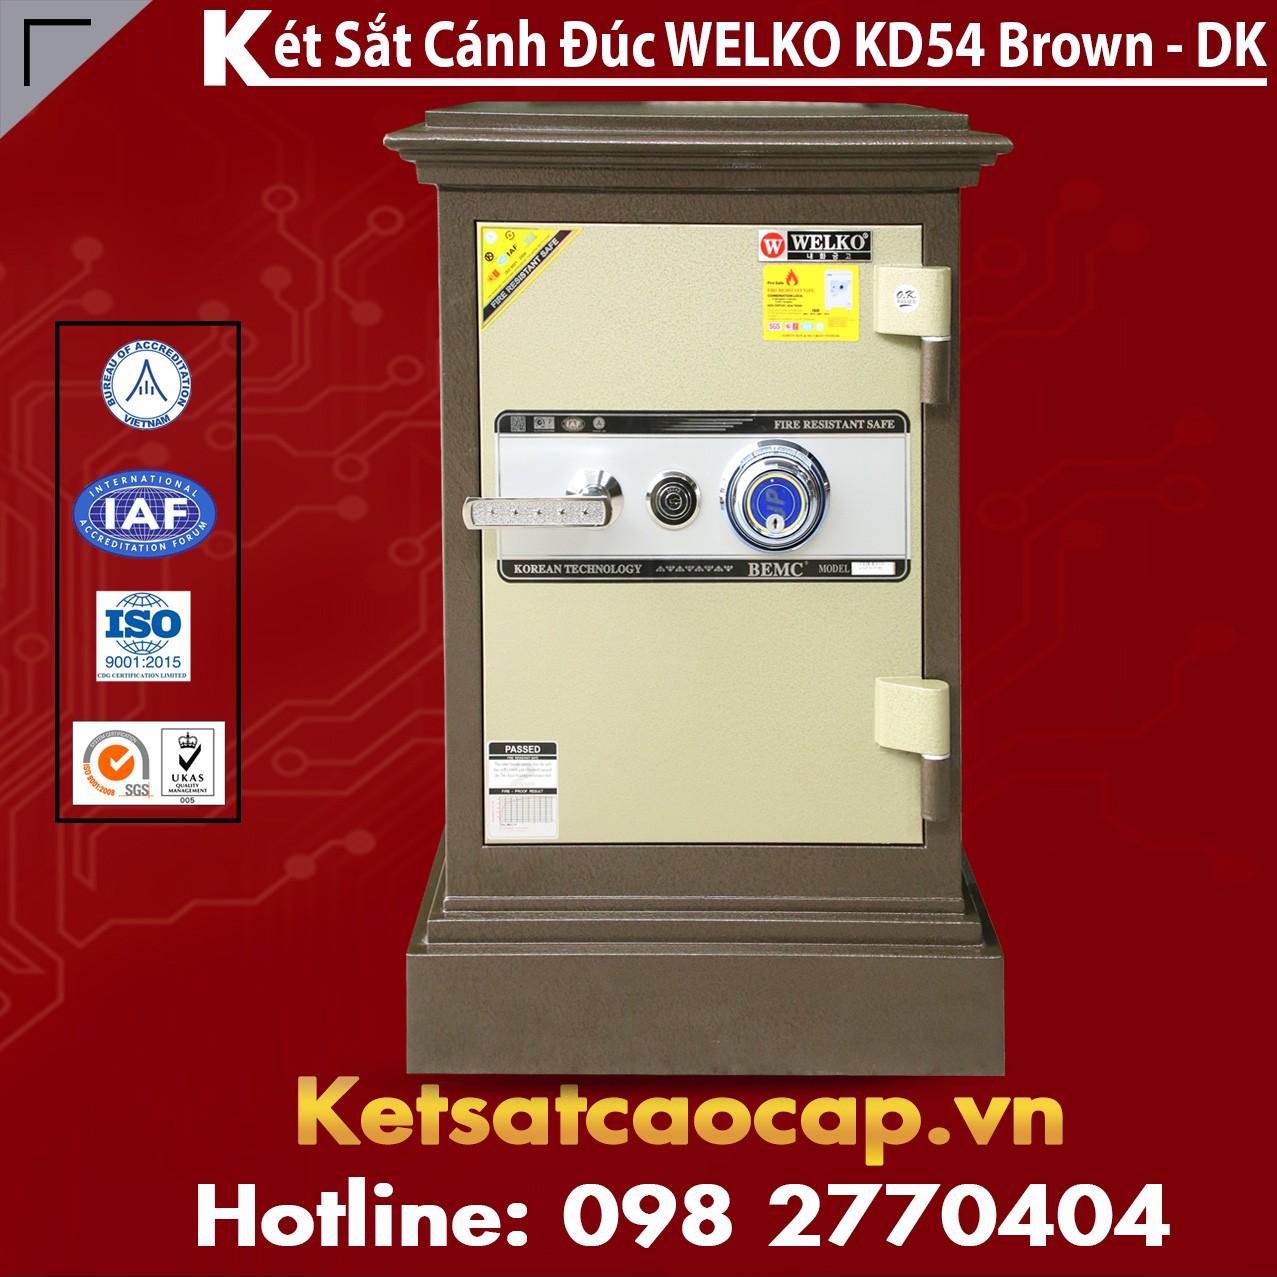 Két Sắt Mini Chính Hãng WELKO KD54 Brown - DK